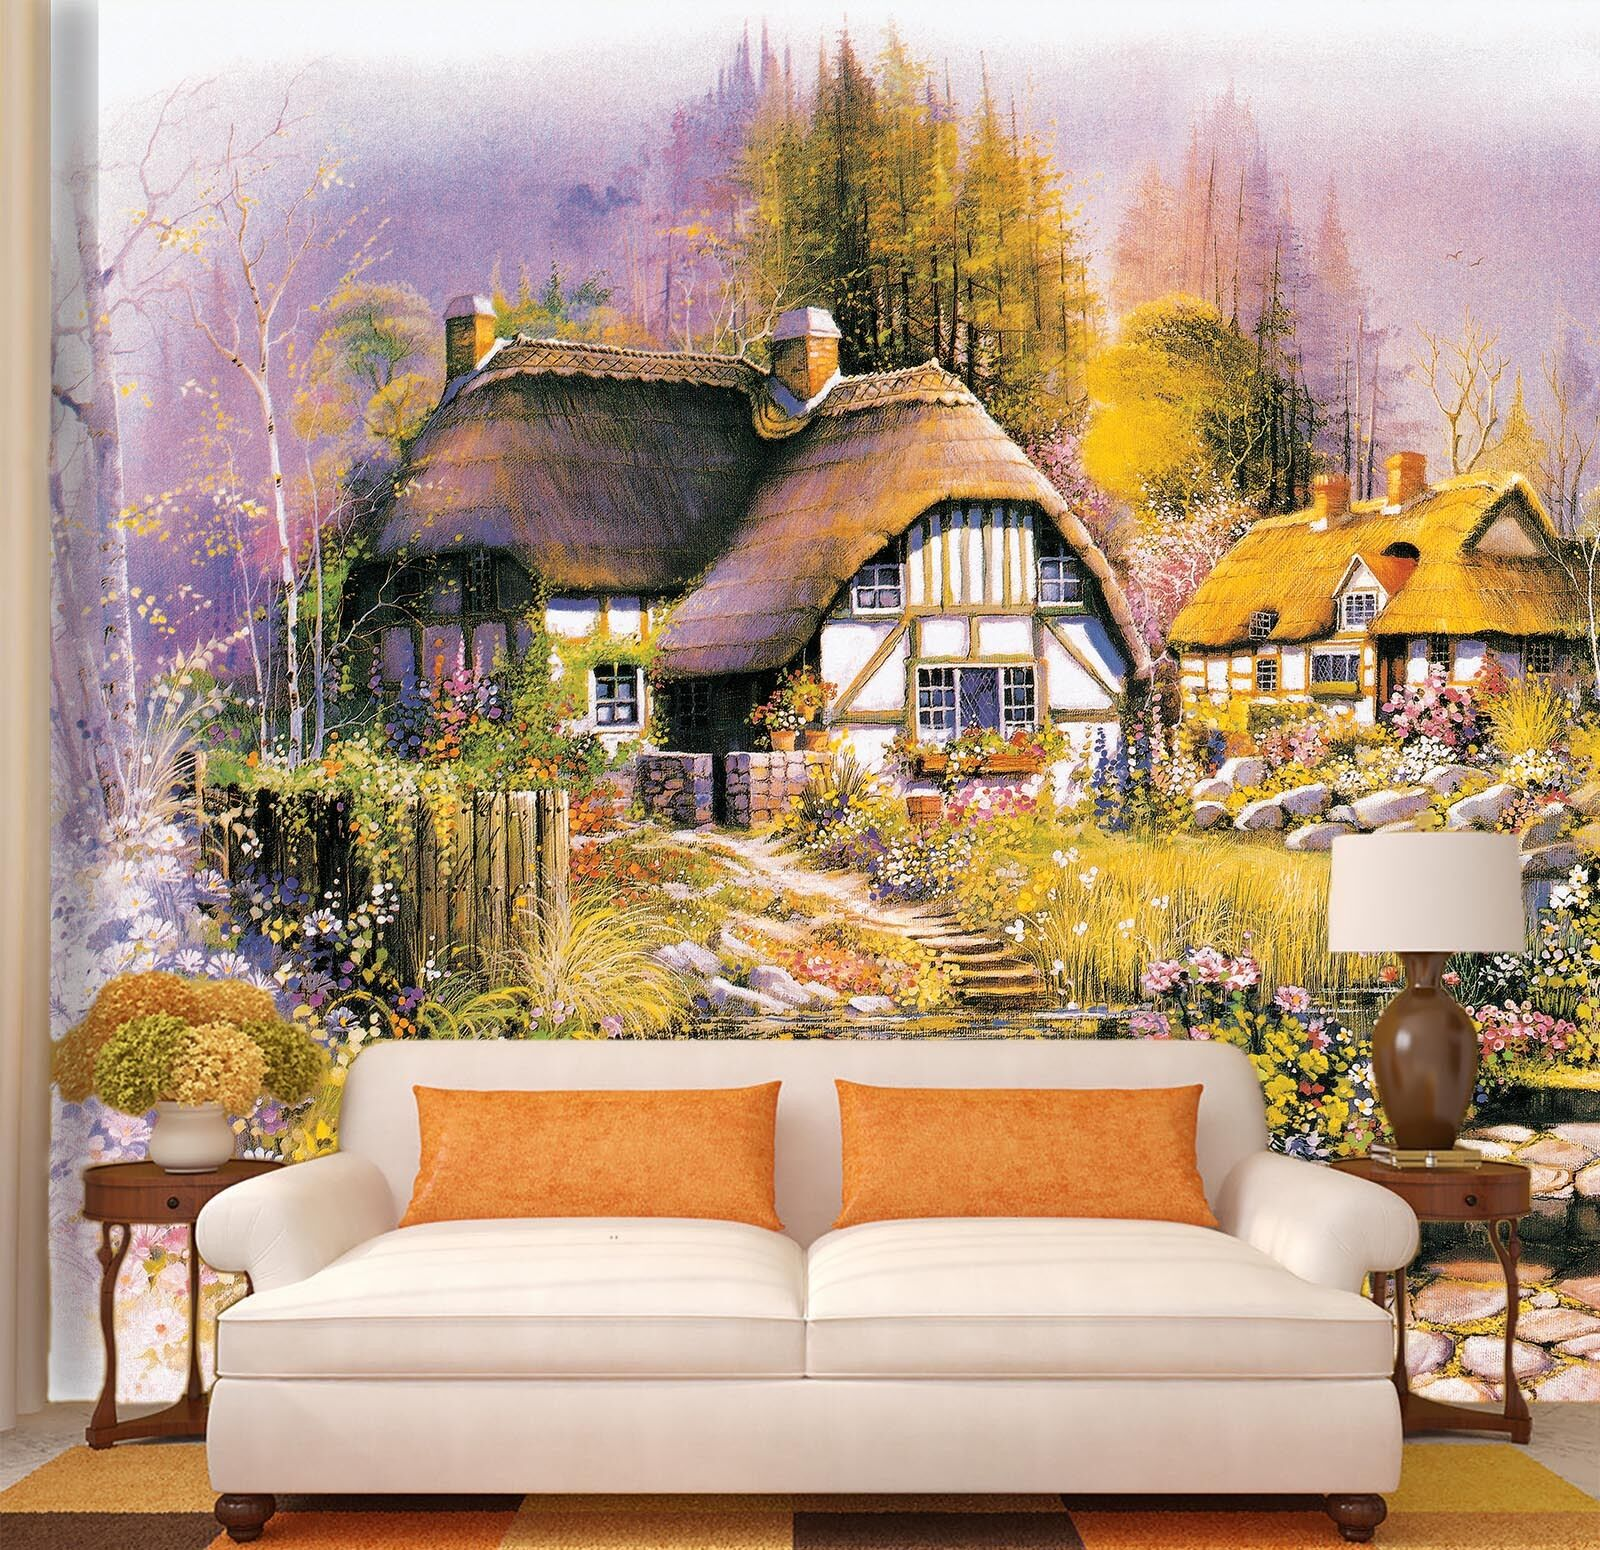 3D Town Oil Painting 1 Paper Wall Print Decal Wall Wall Murals AJ WALLPAPER GB